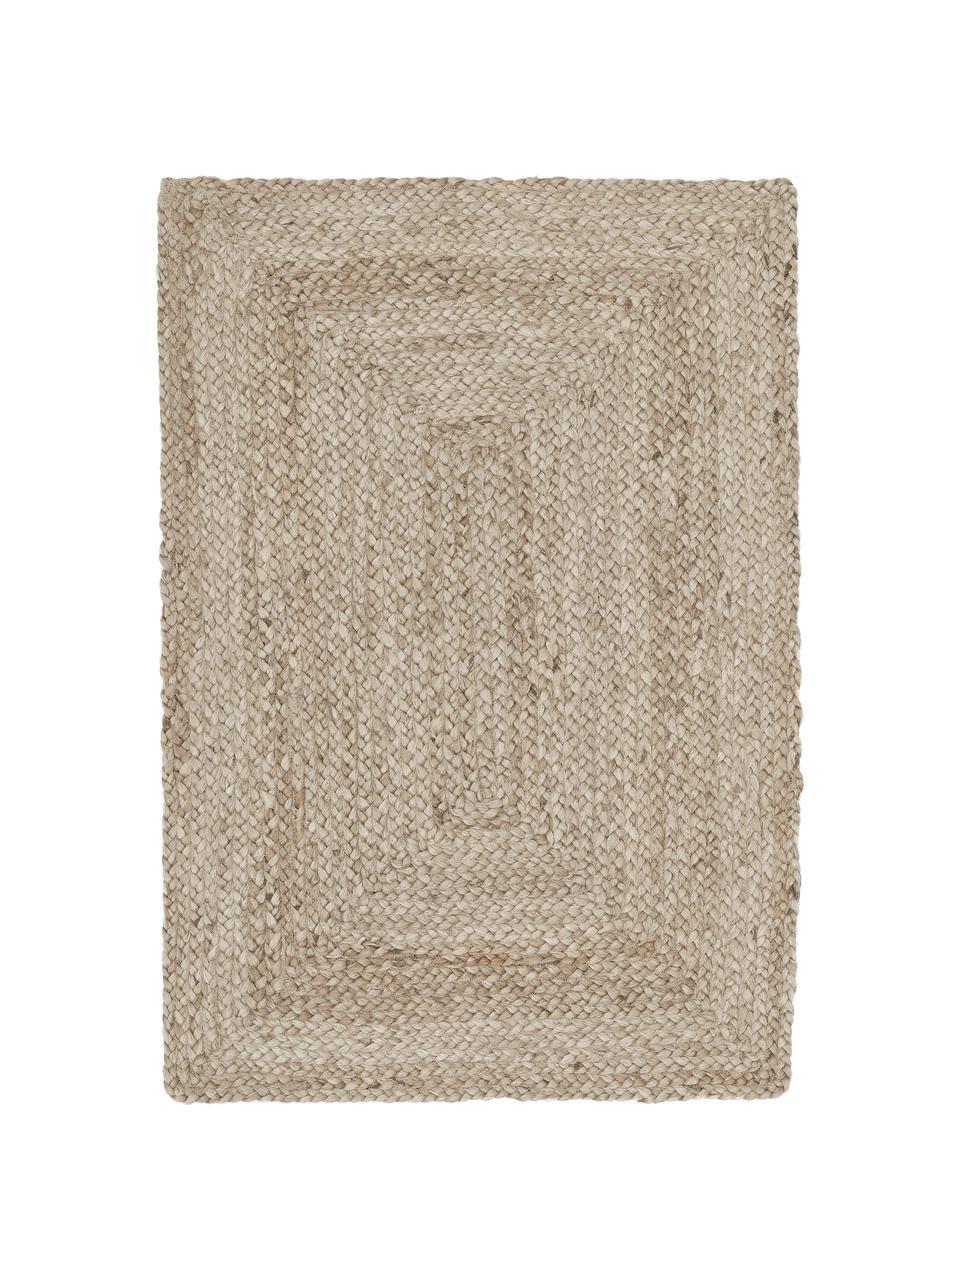 Alfombra artesanal de yute Sharmila, 100%yute, Beige, An 200 x L 300 cm(Tamaño L)